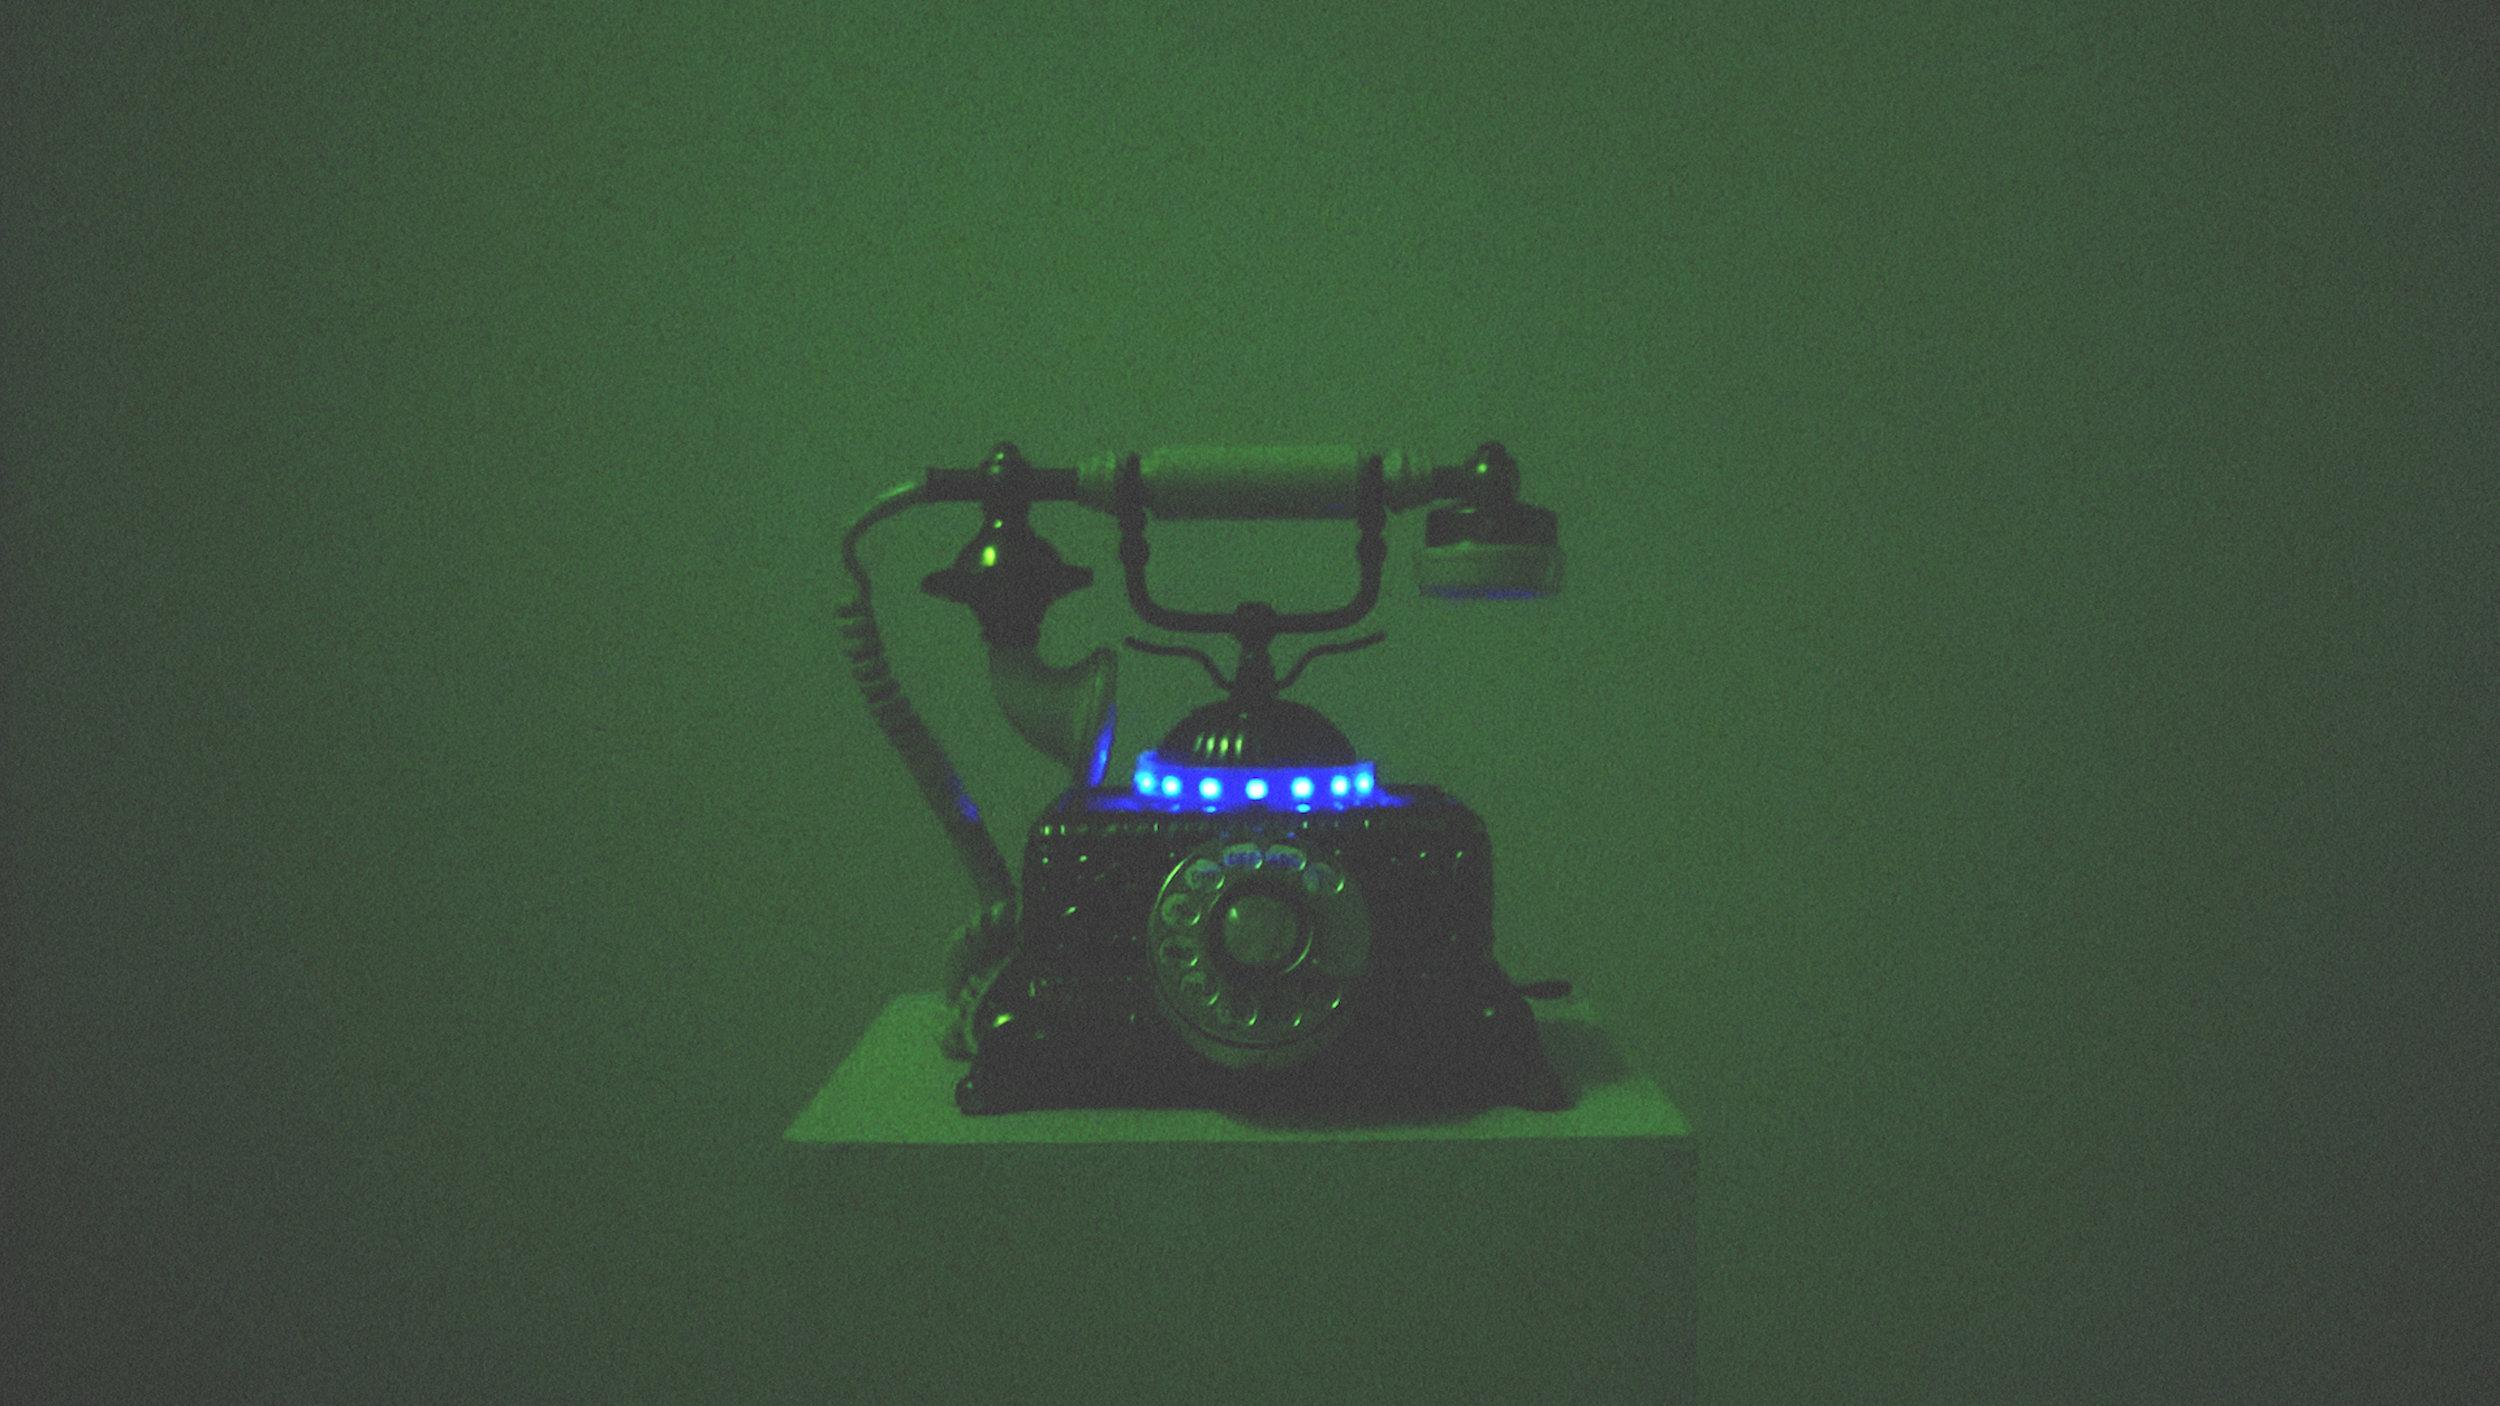 contrasting technologies (sva)